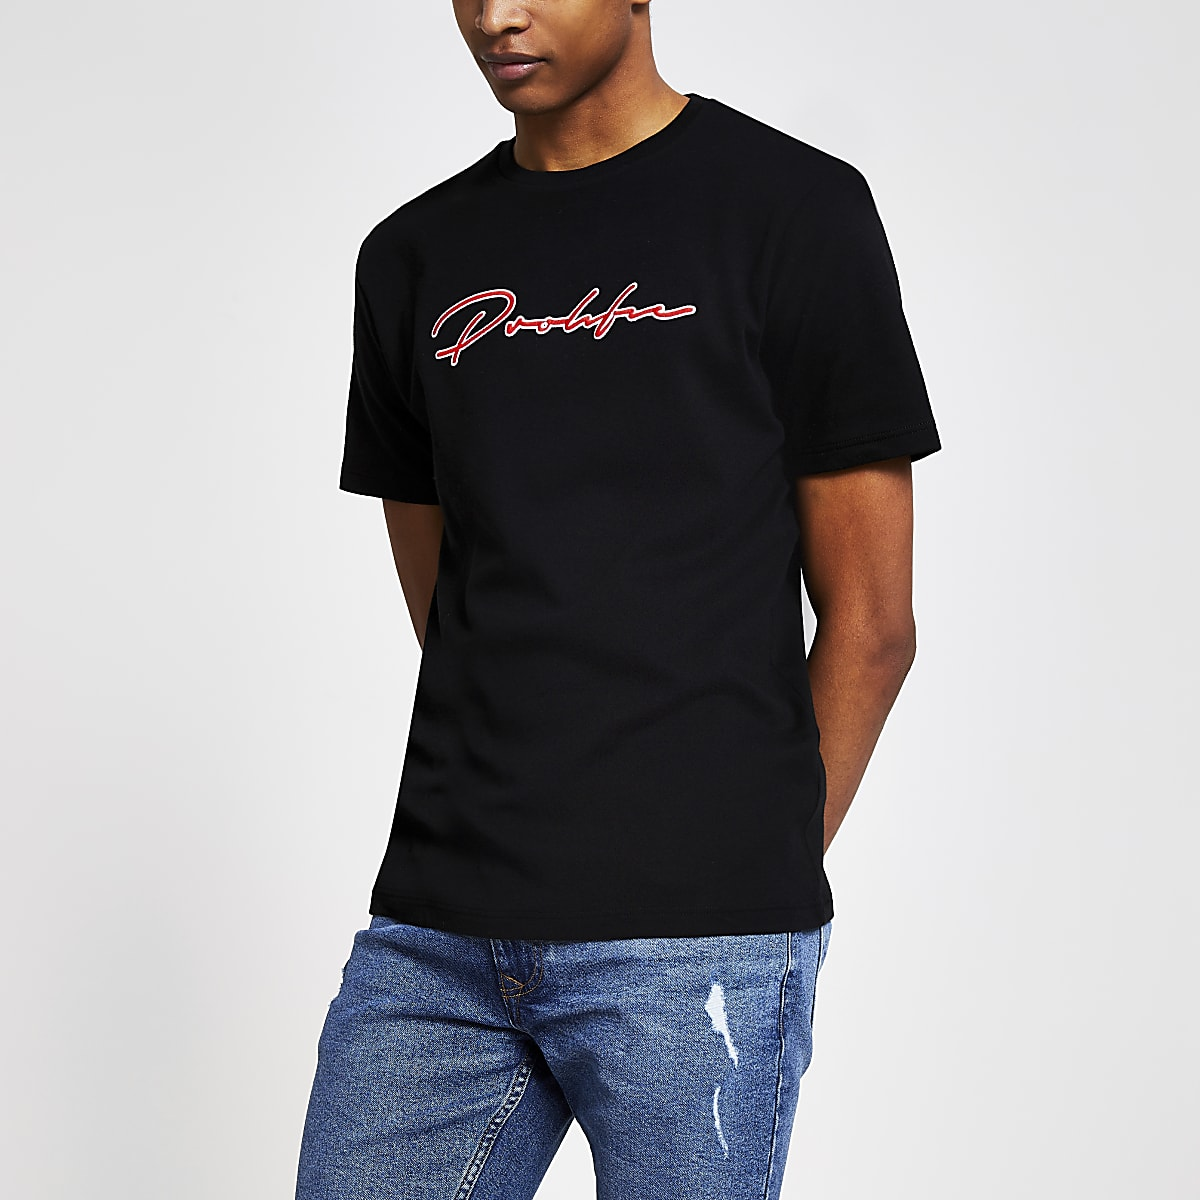 Black 'Prolific' embroidered slim fit T-shirt